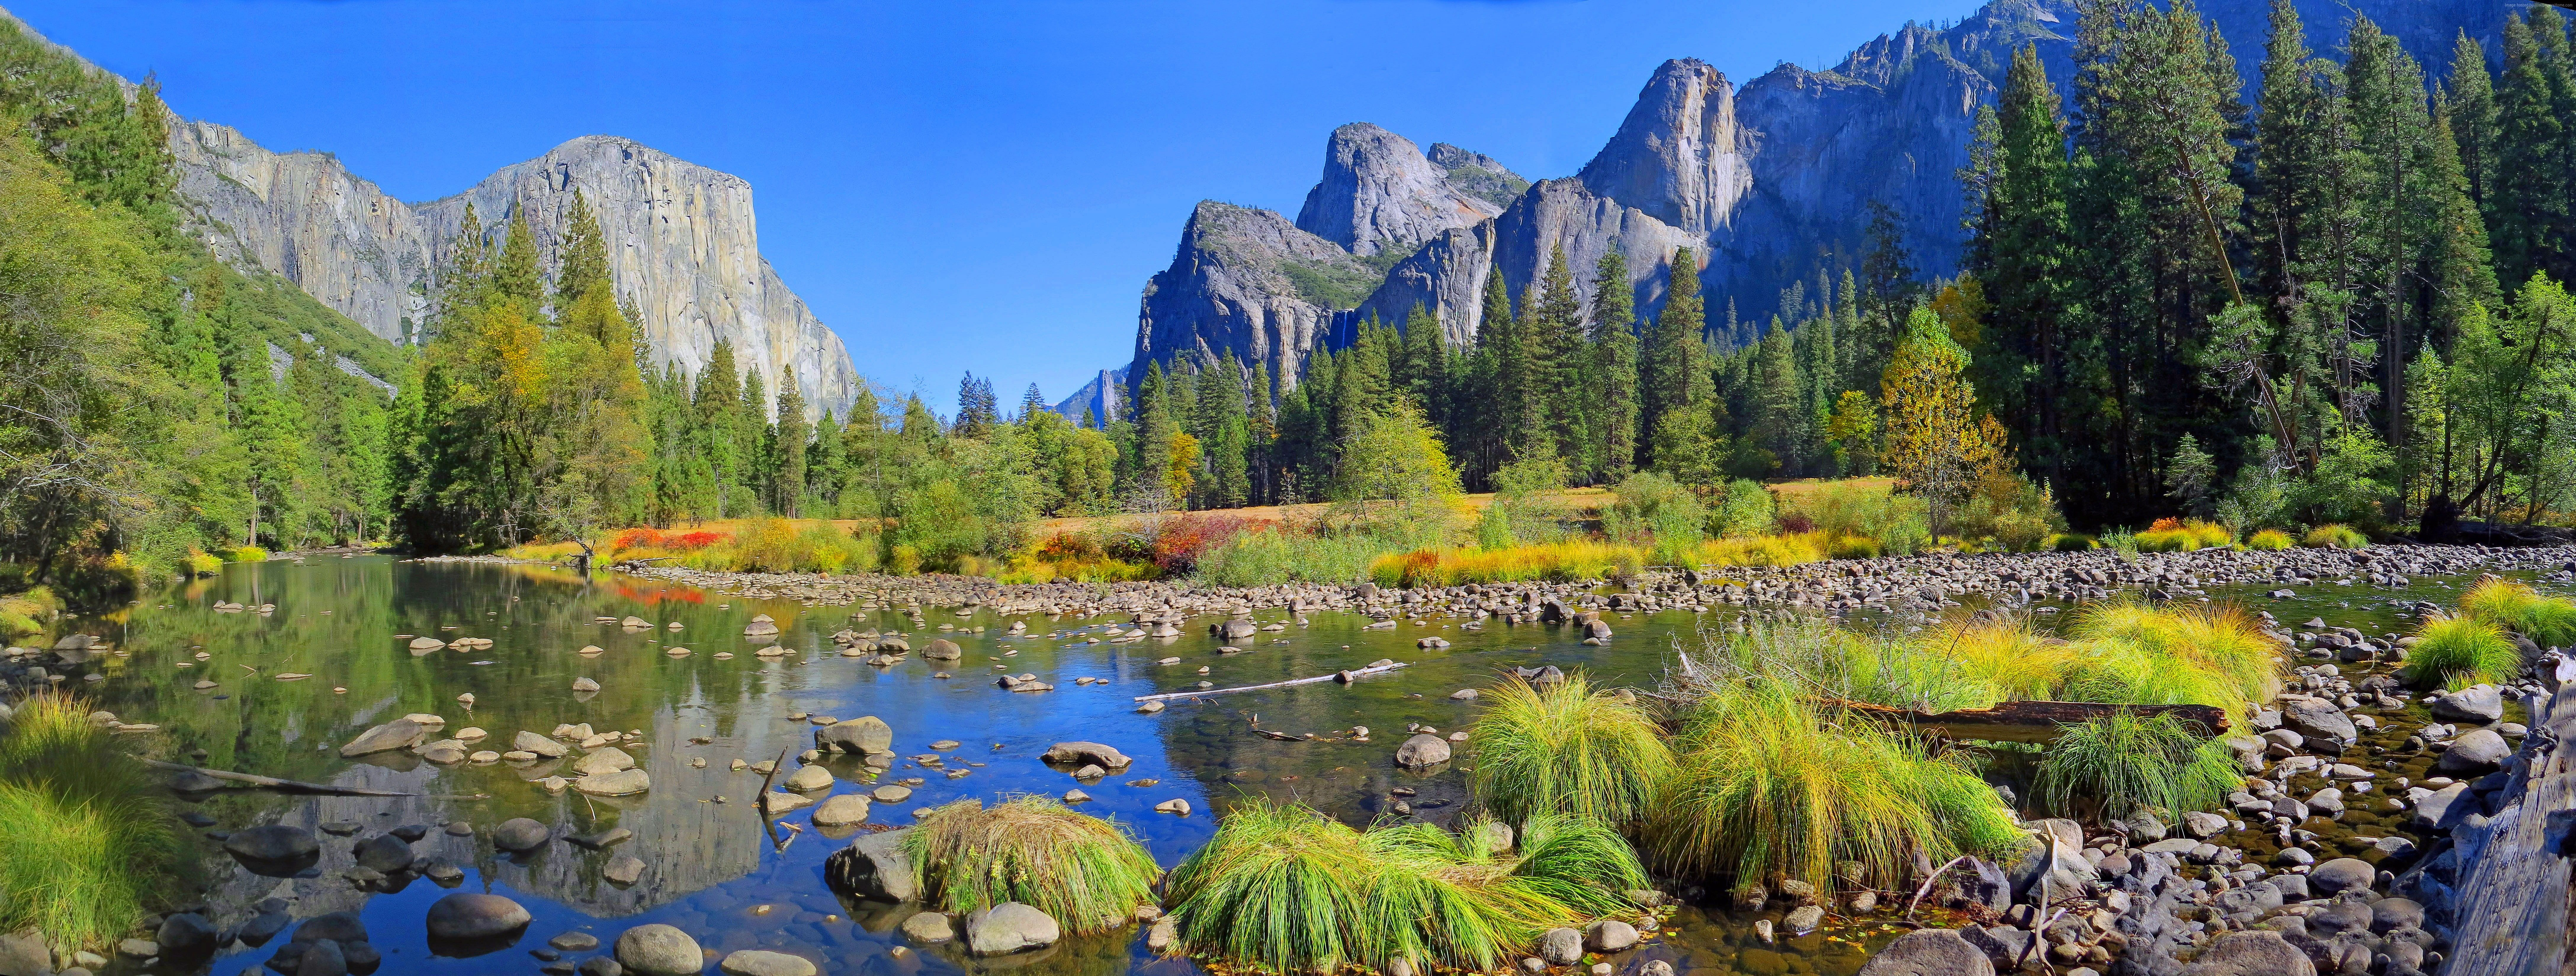 4k Apple Mountains 5k Forest Yosemite Osx 8k 8k Wallpaper Hdwallpaper Desktop Yosemite Wallpaper Yosemite Uhd Wallpaper